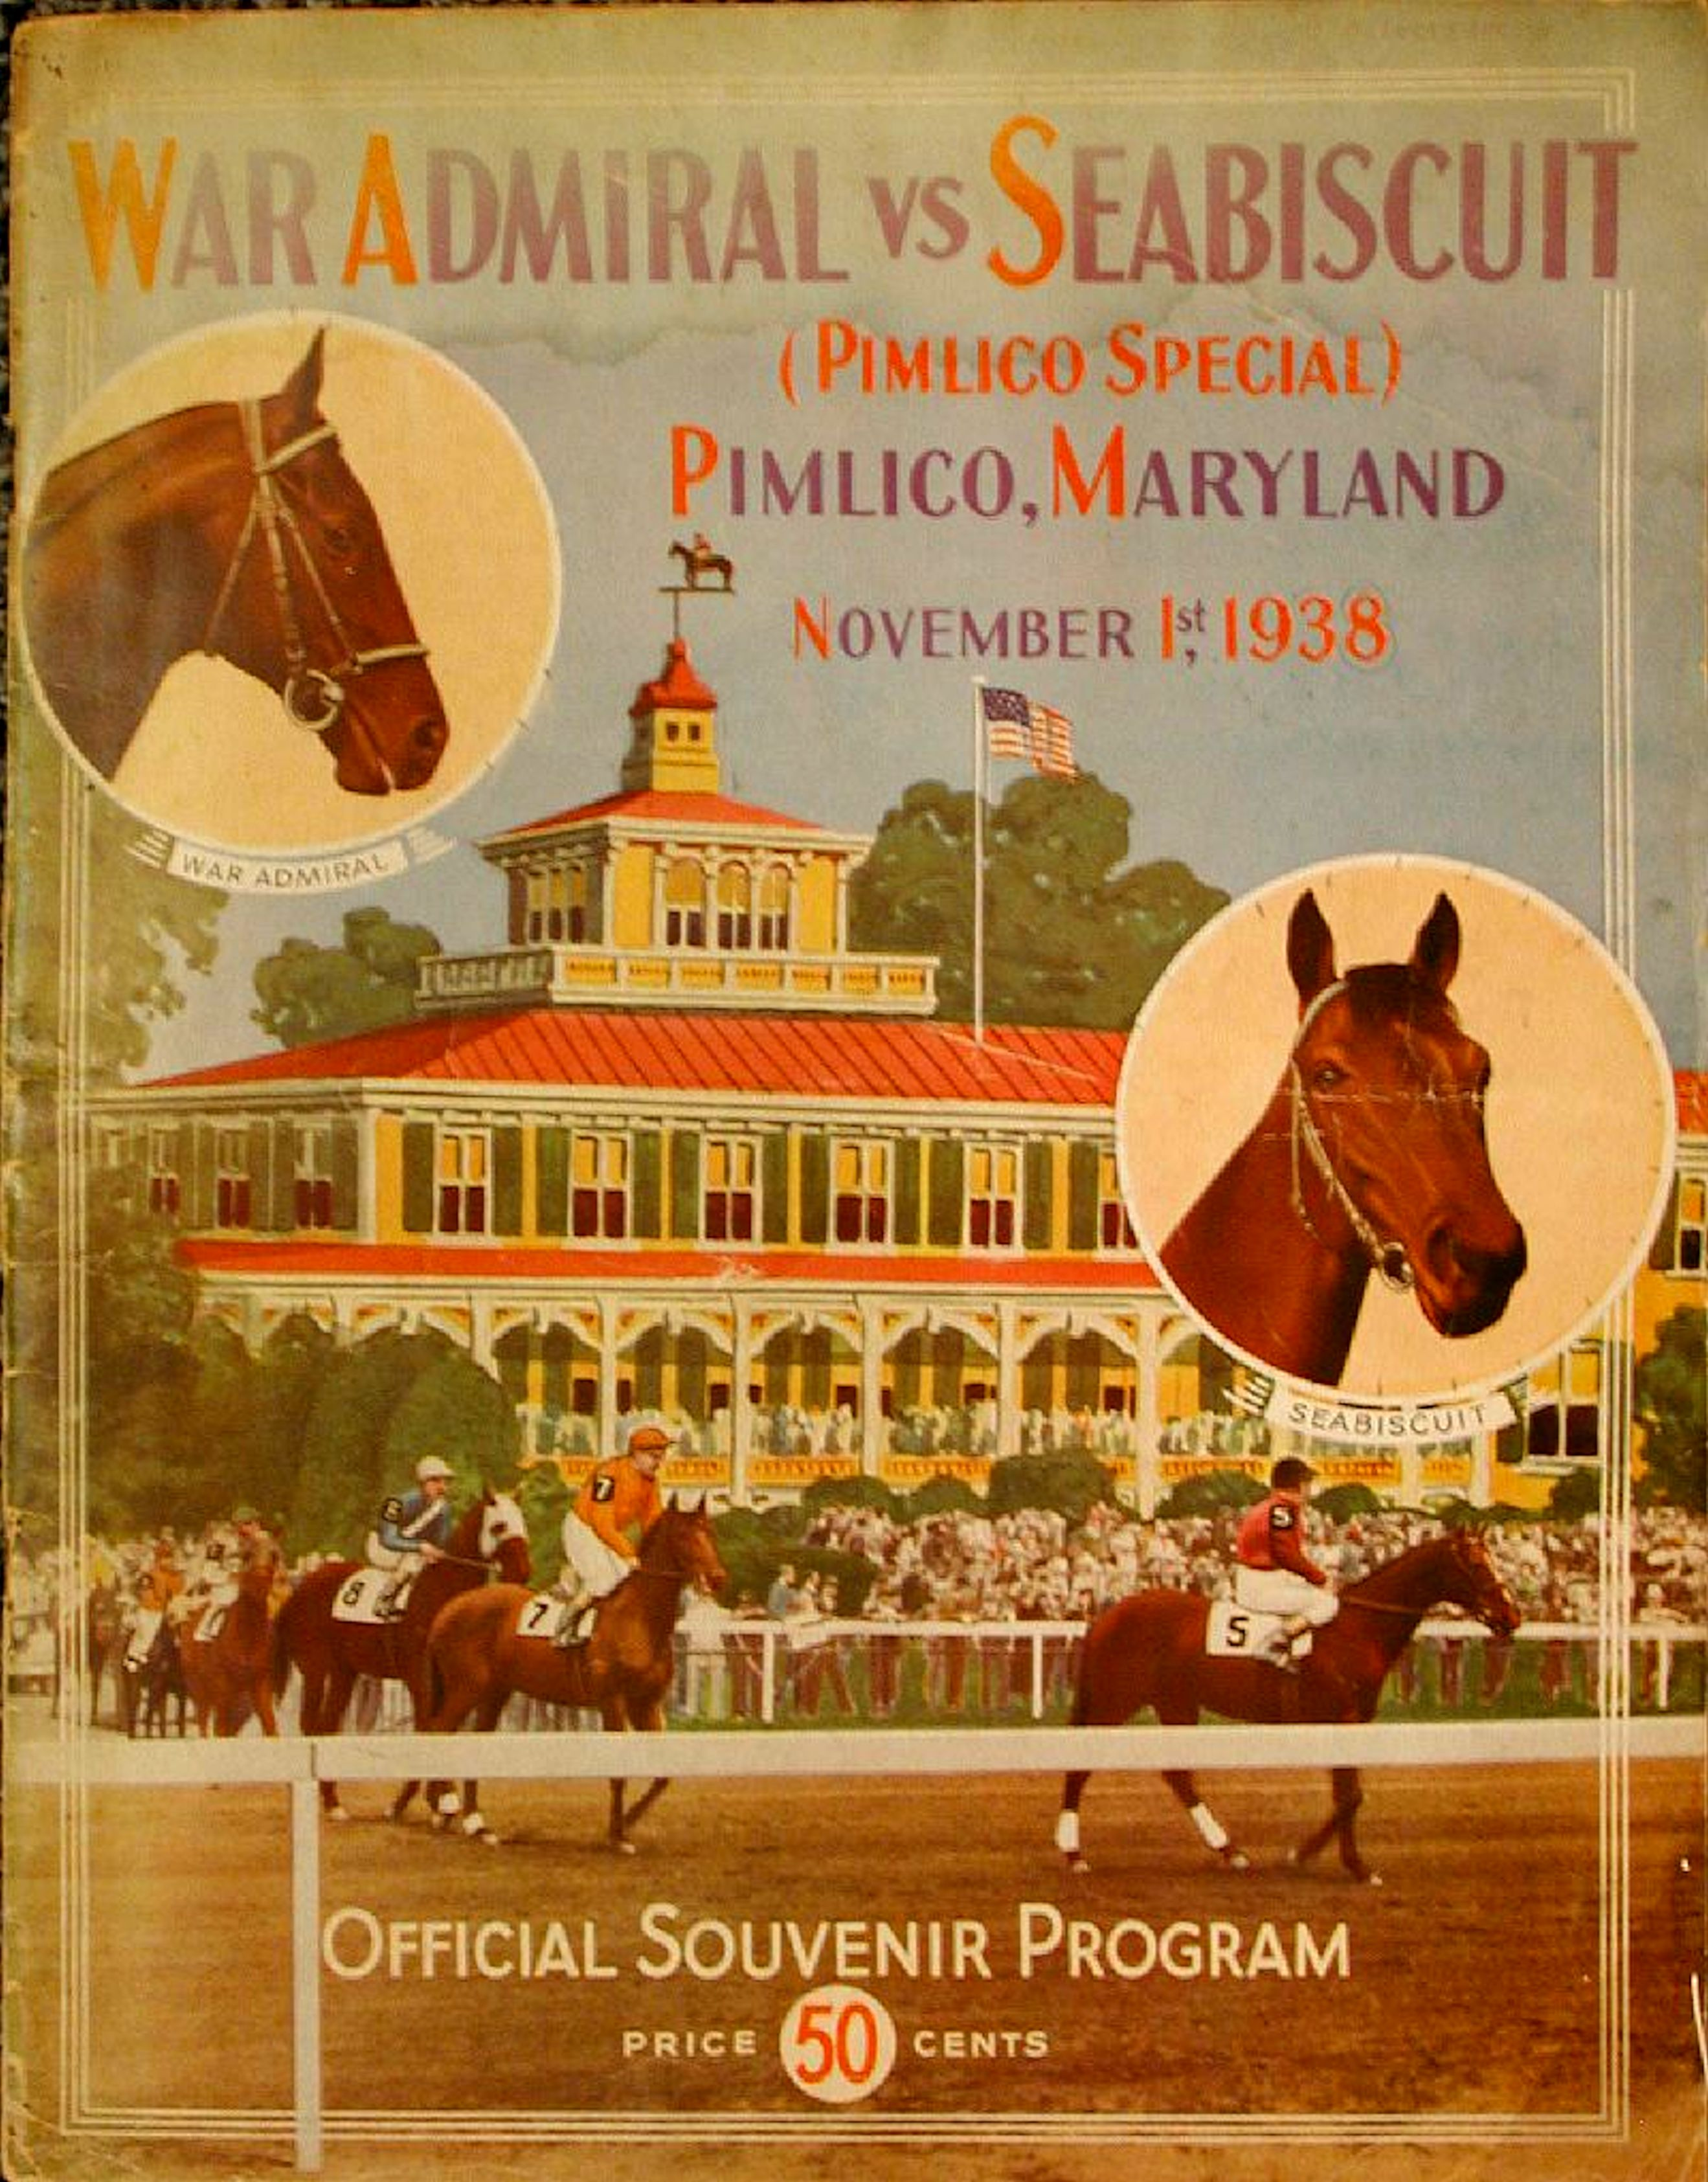 1938 Pimlico Special program (Museum Collection)